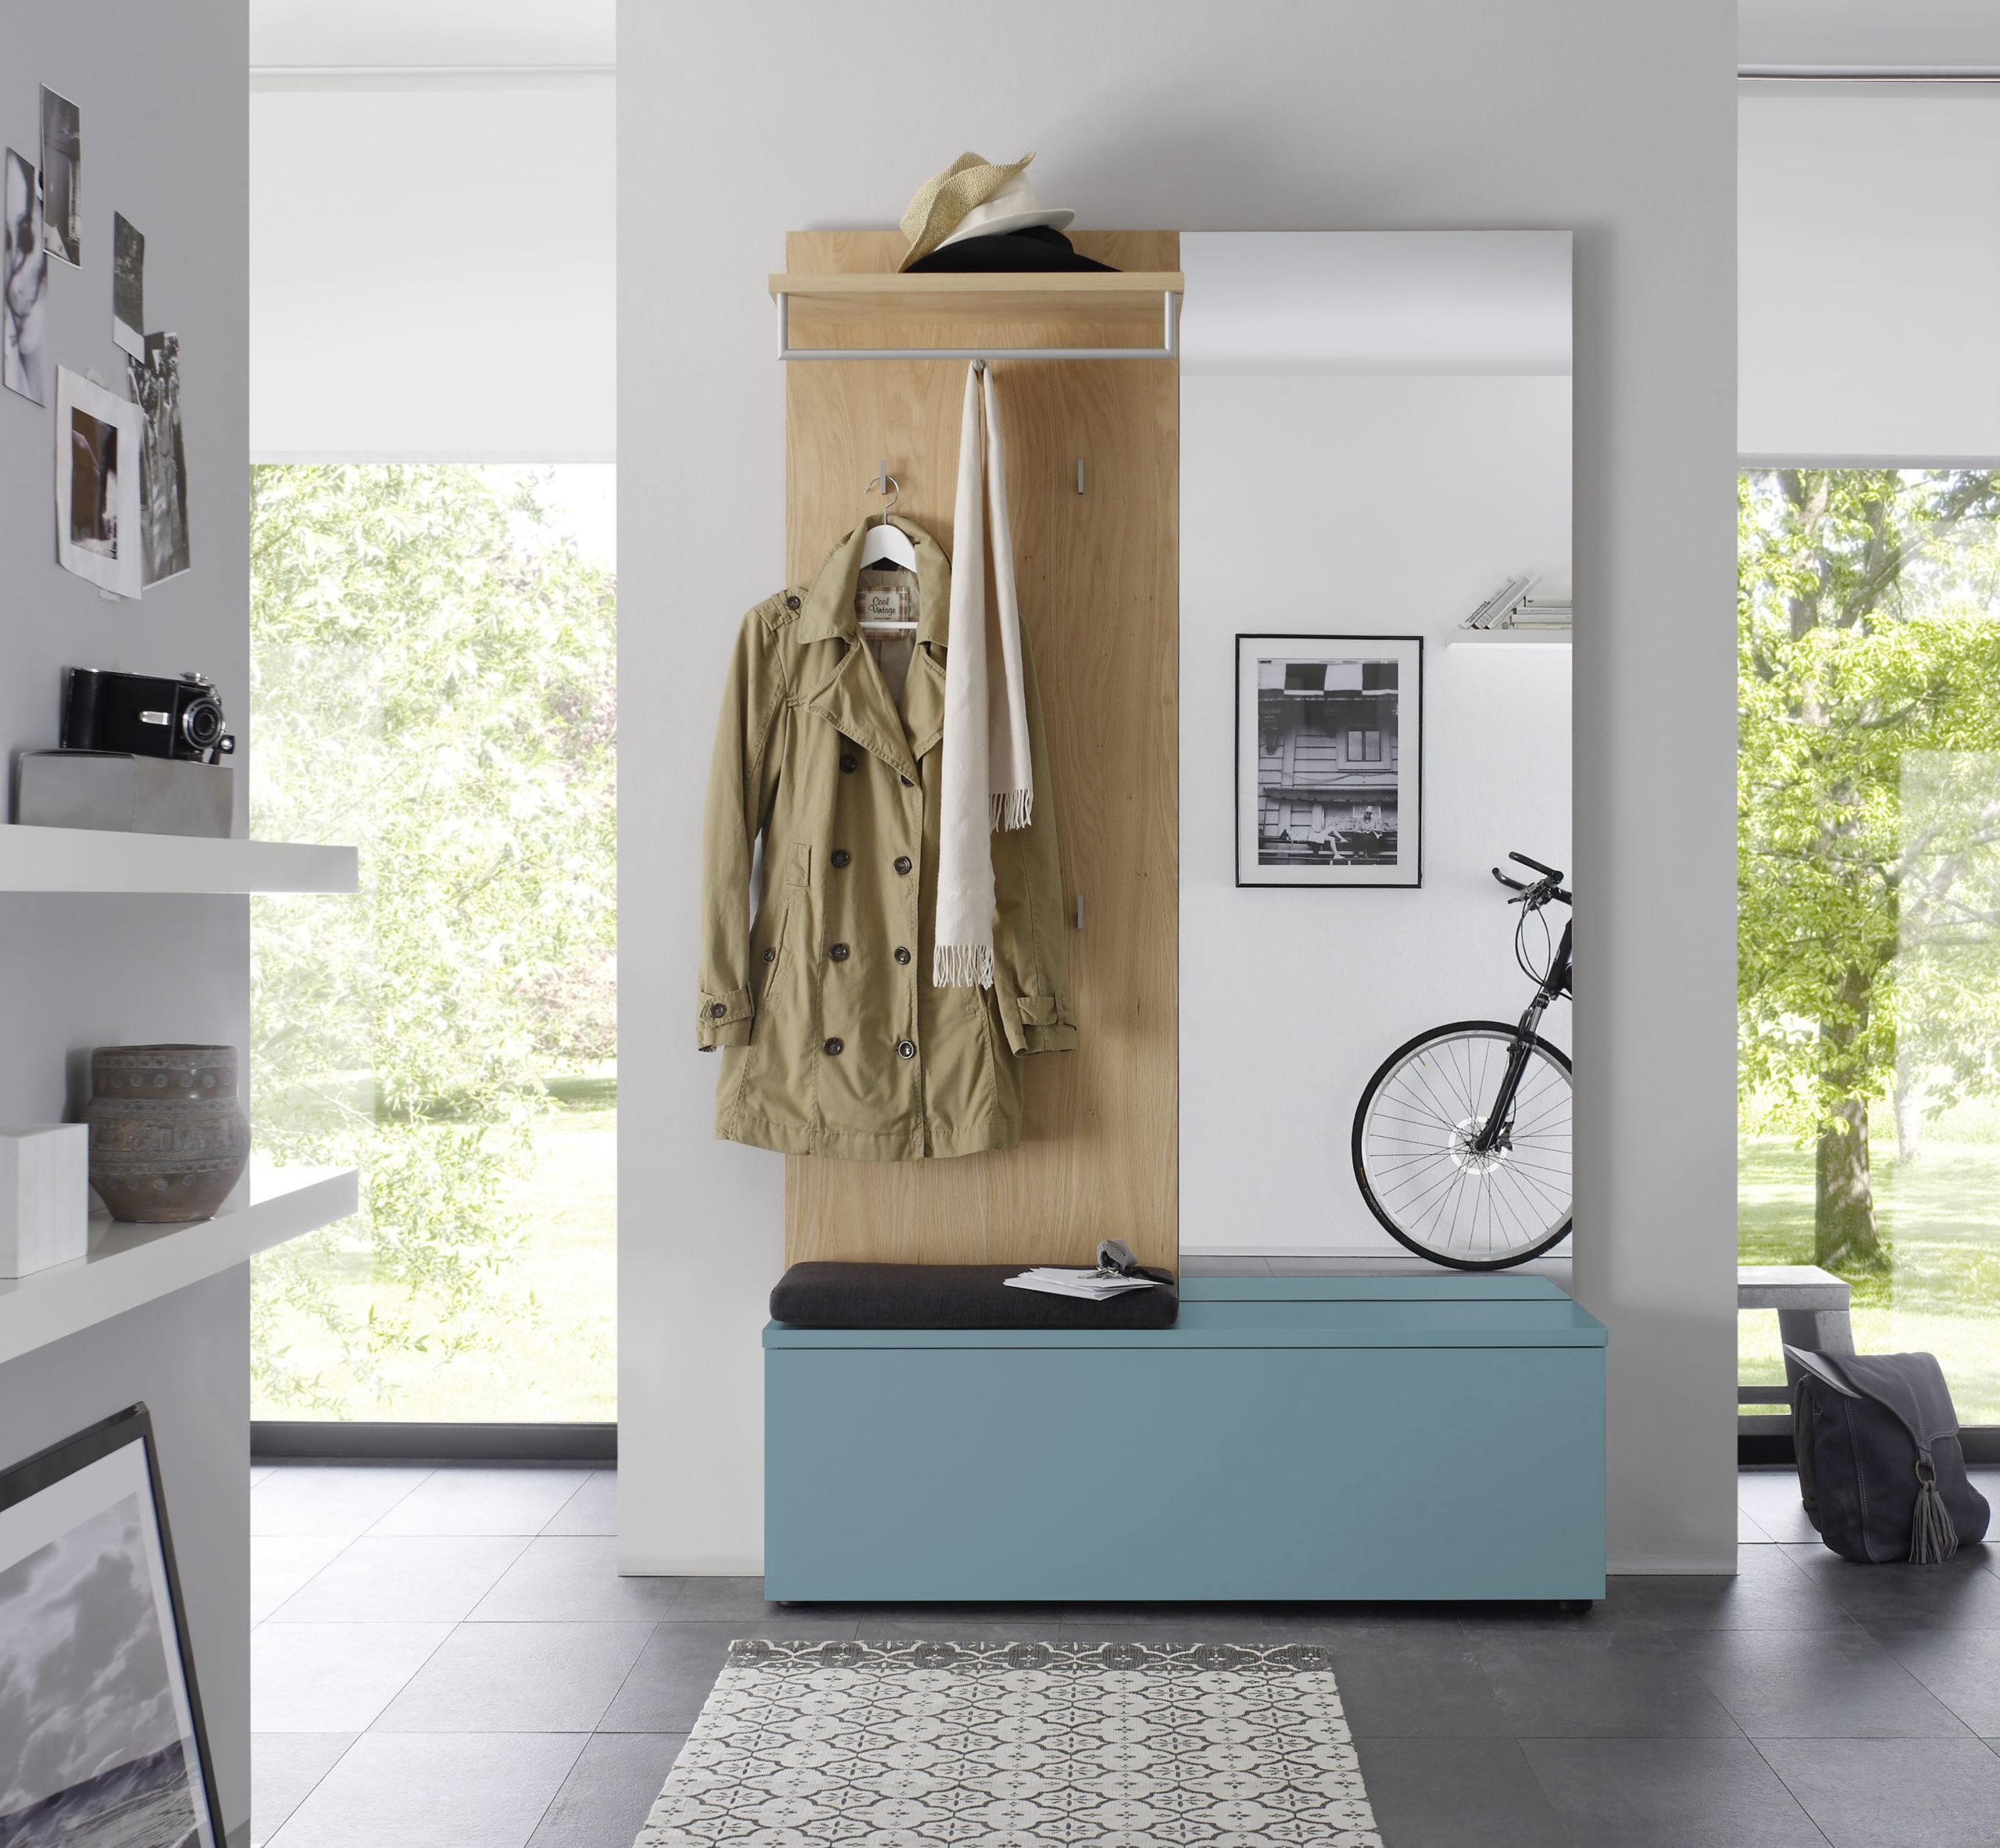 Sudbrock TANDO Garderobe in der Ausführung Ethno Eiche, Lack taubenblau #498